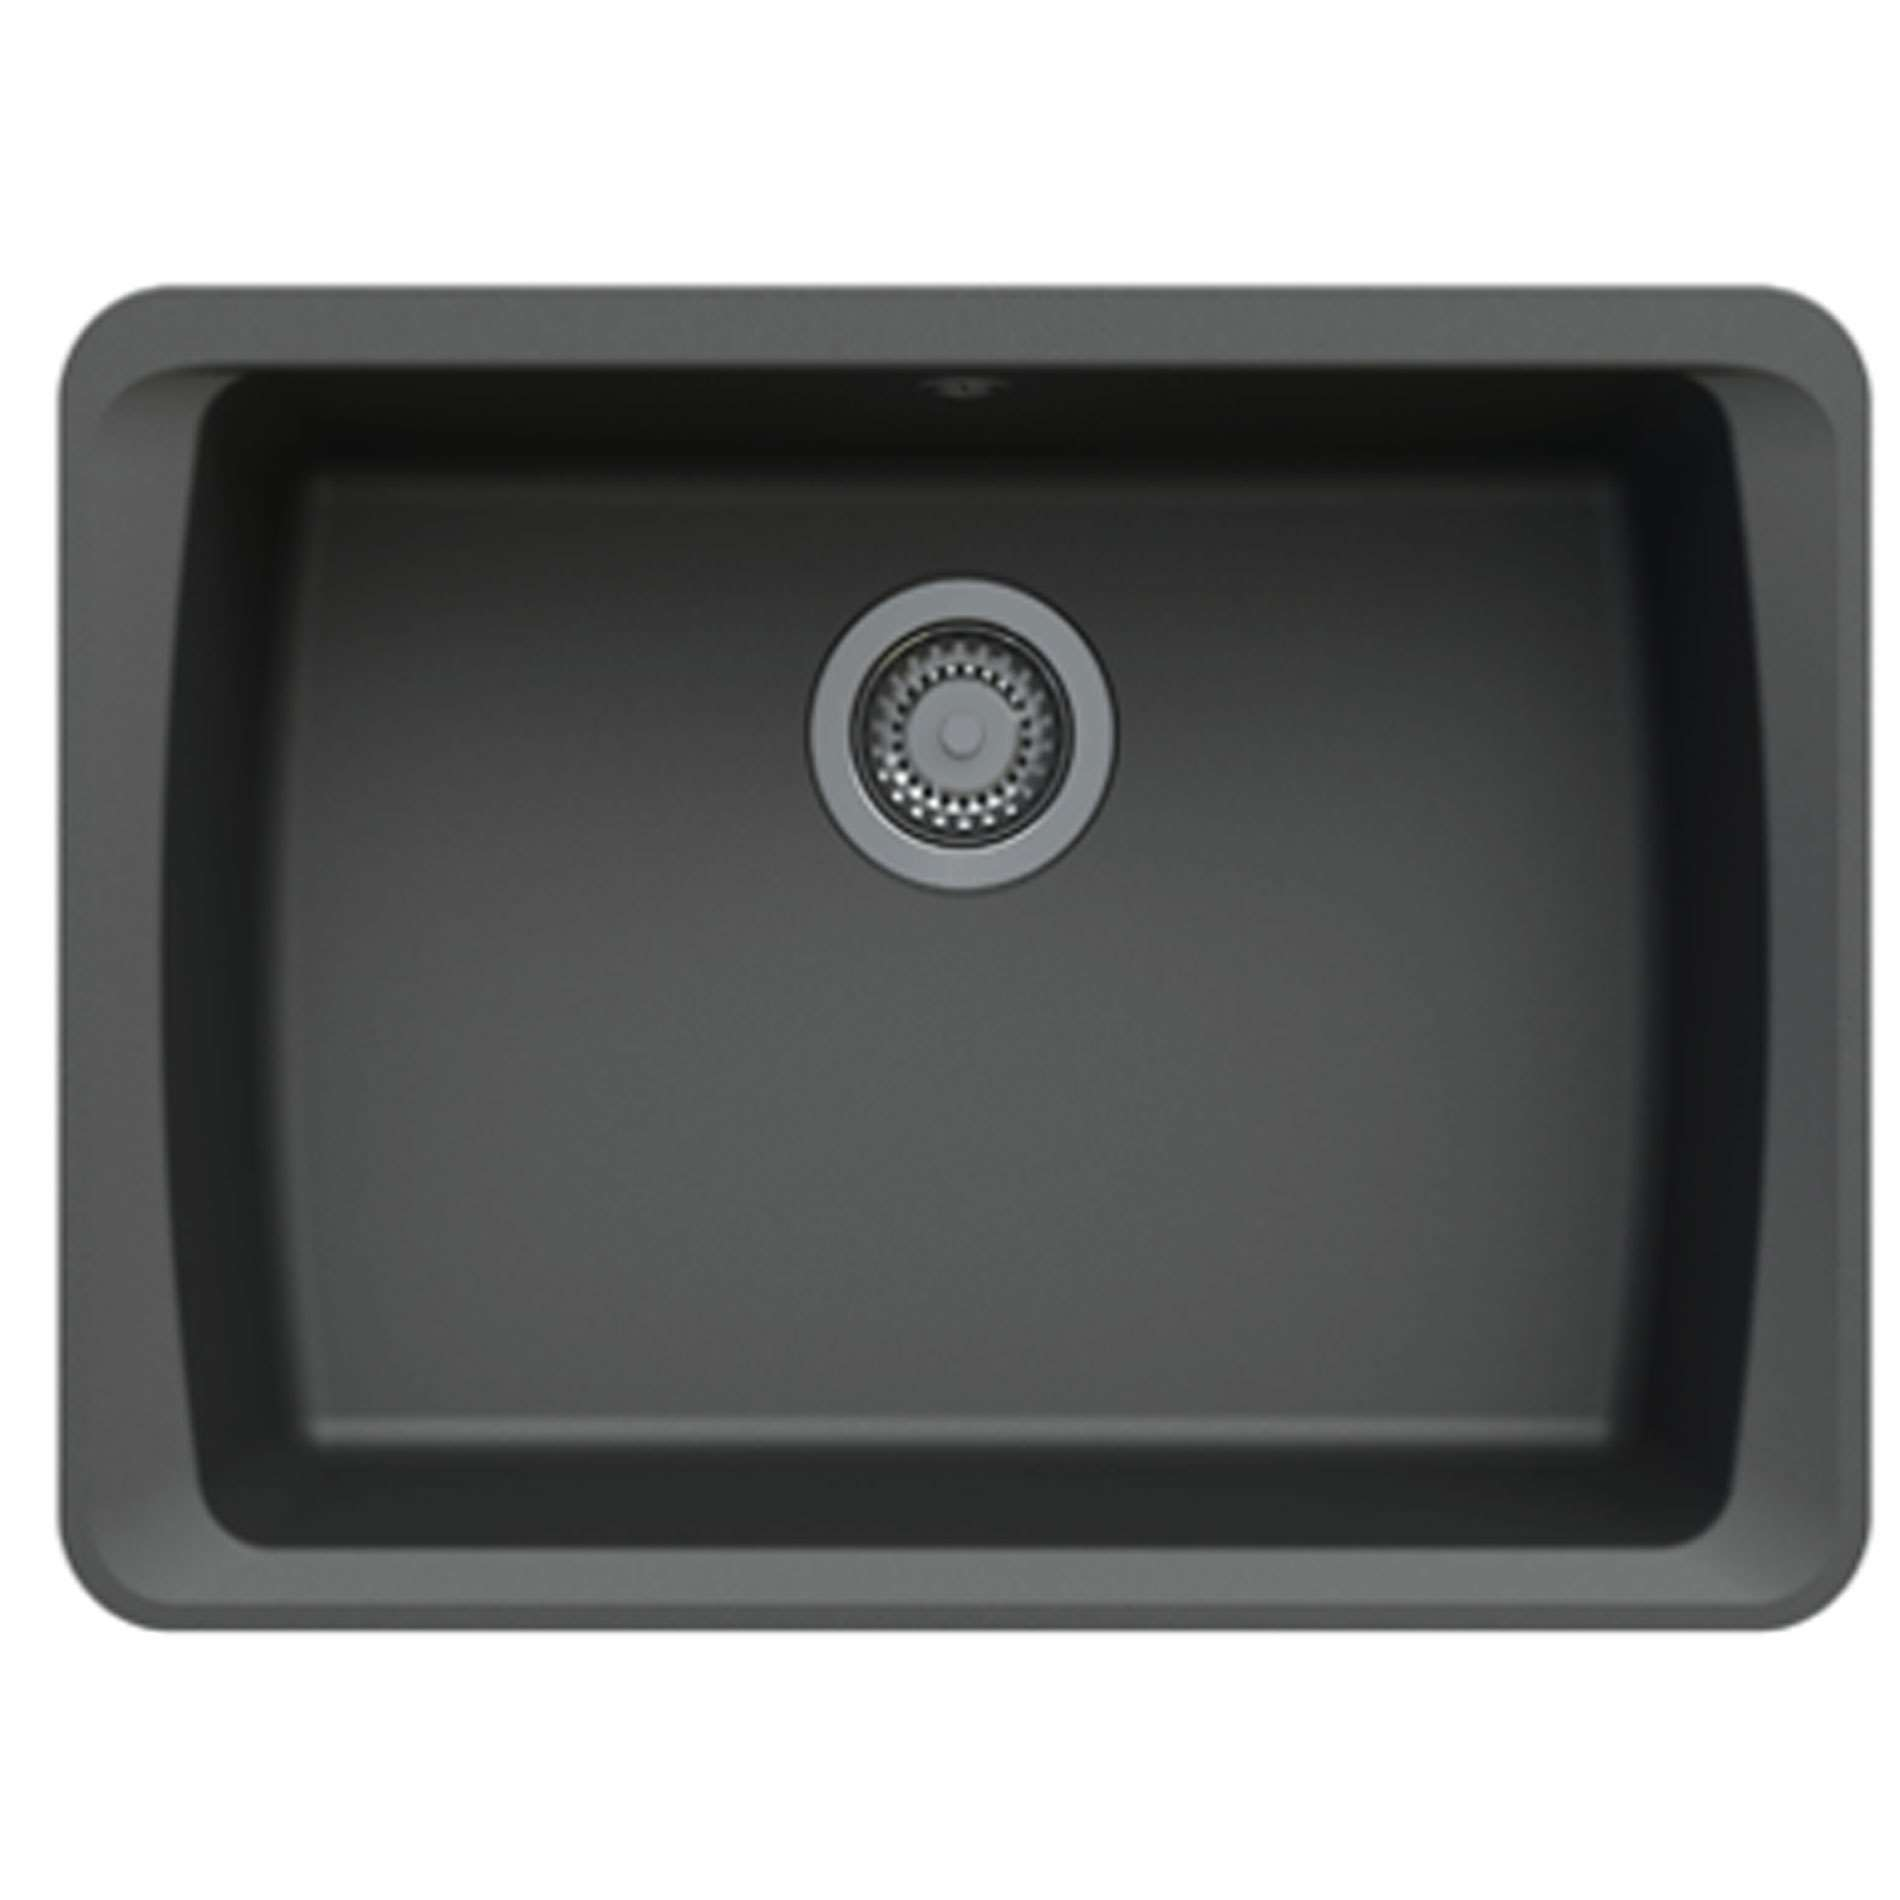 Astracast: Barden 1.0 Bowl Volcano Black ROK Granite Sink - Kitchen ...